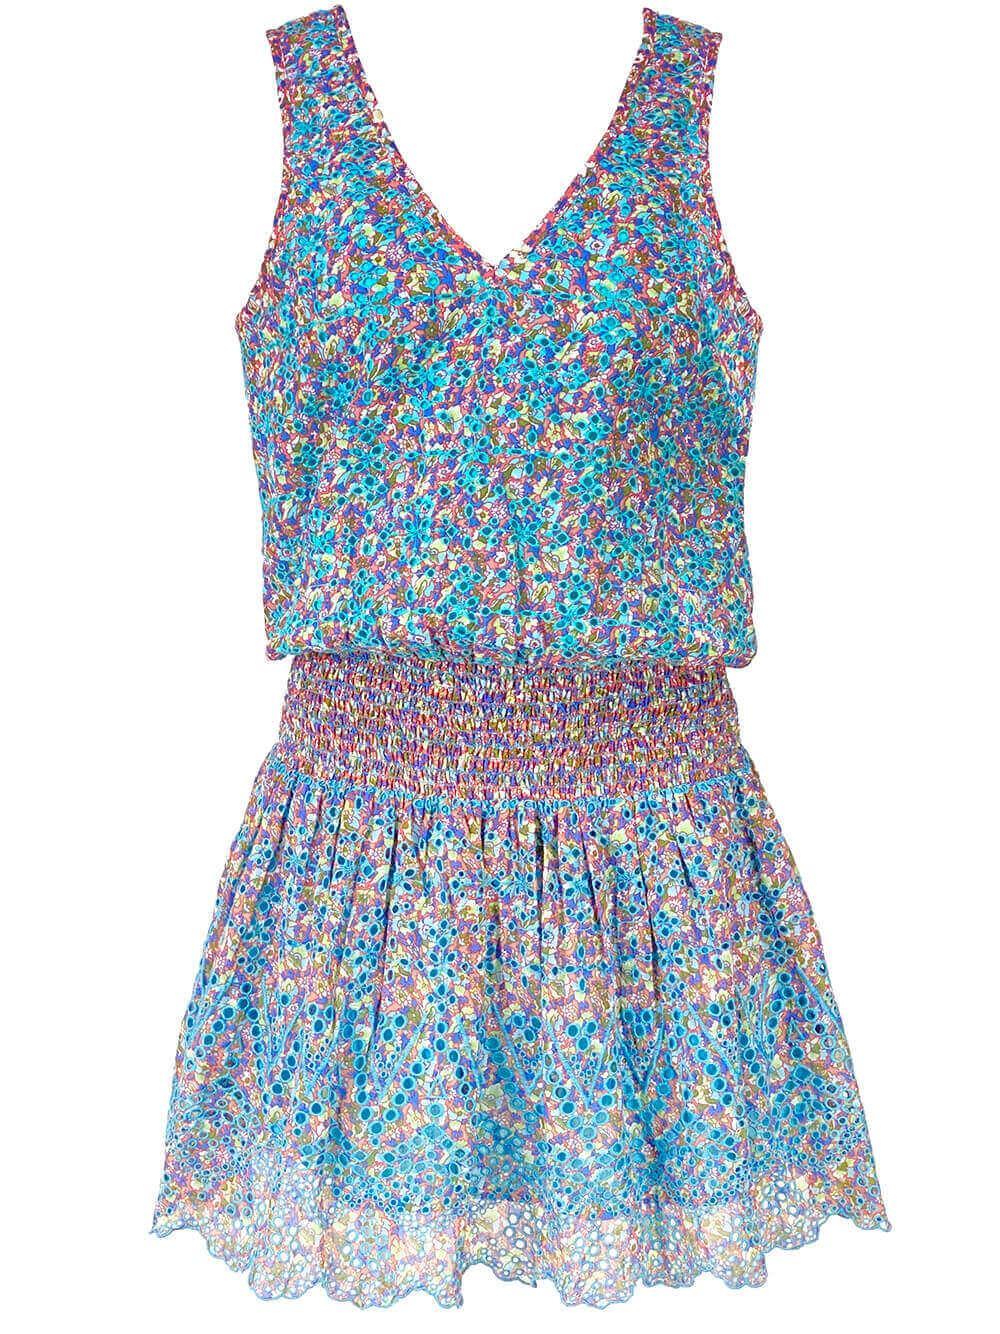 Dorris Dress Item # A0521310